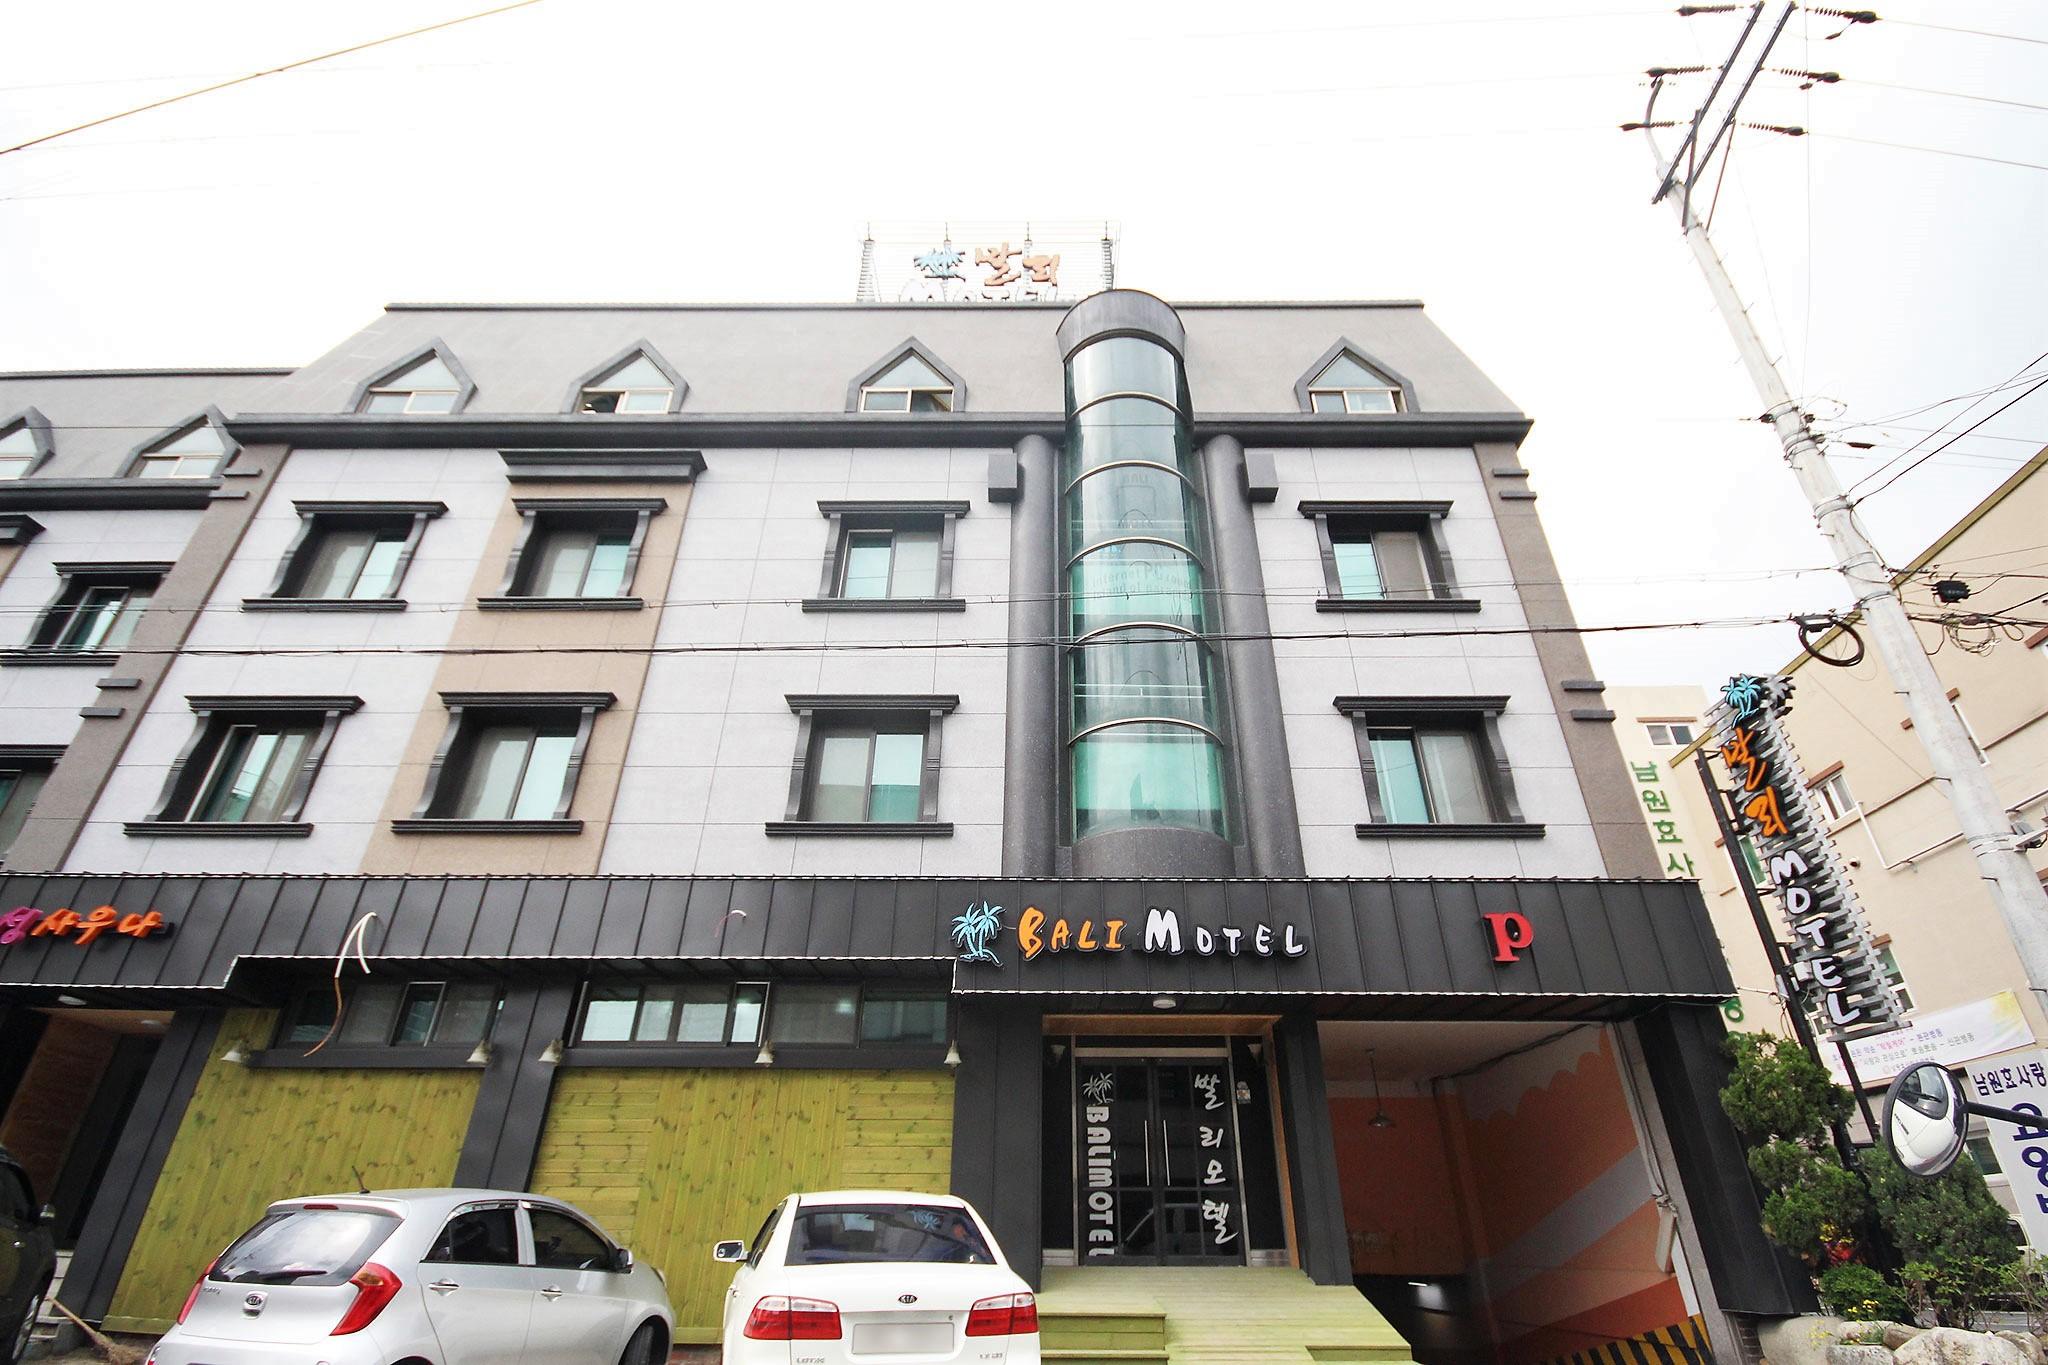 Bali Motel [Korea Quality] / 발리모텔 [한국관광 품질인증]